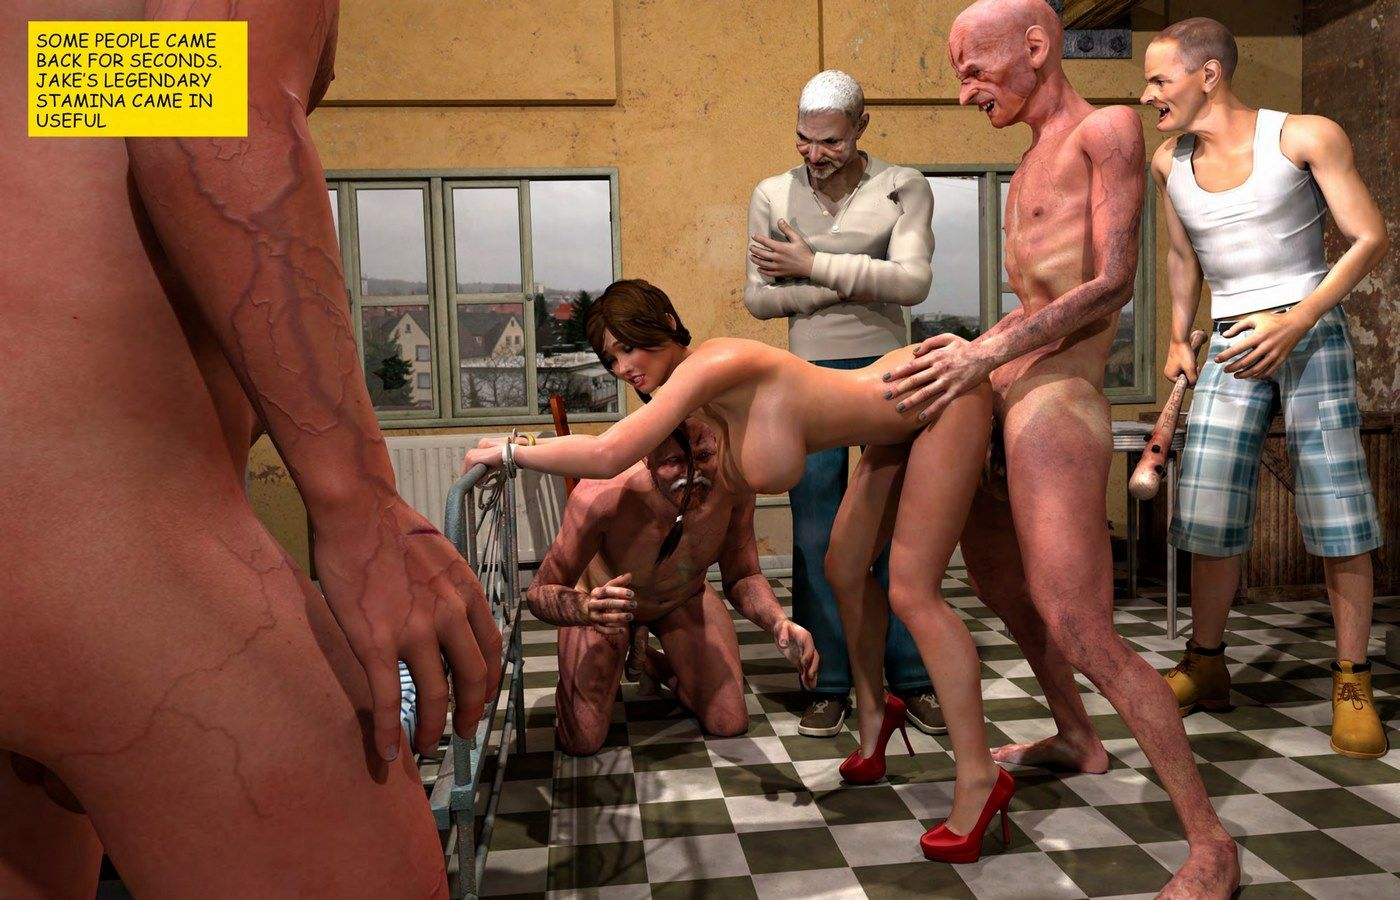 Motherless losing bets porn hot porn